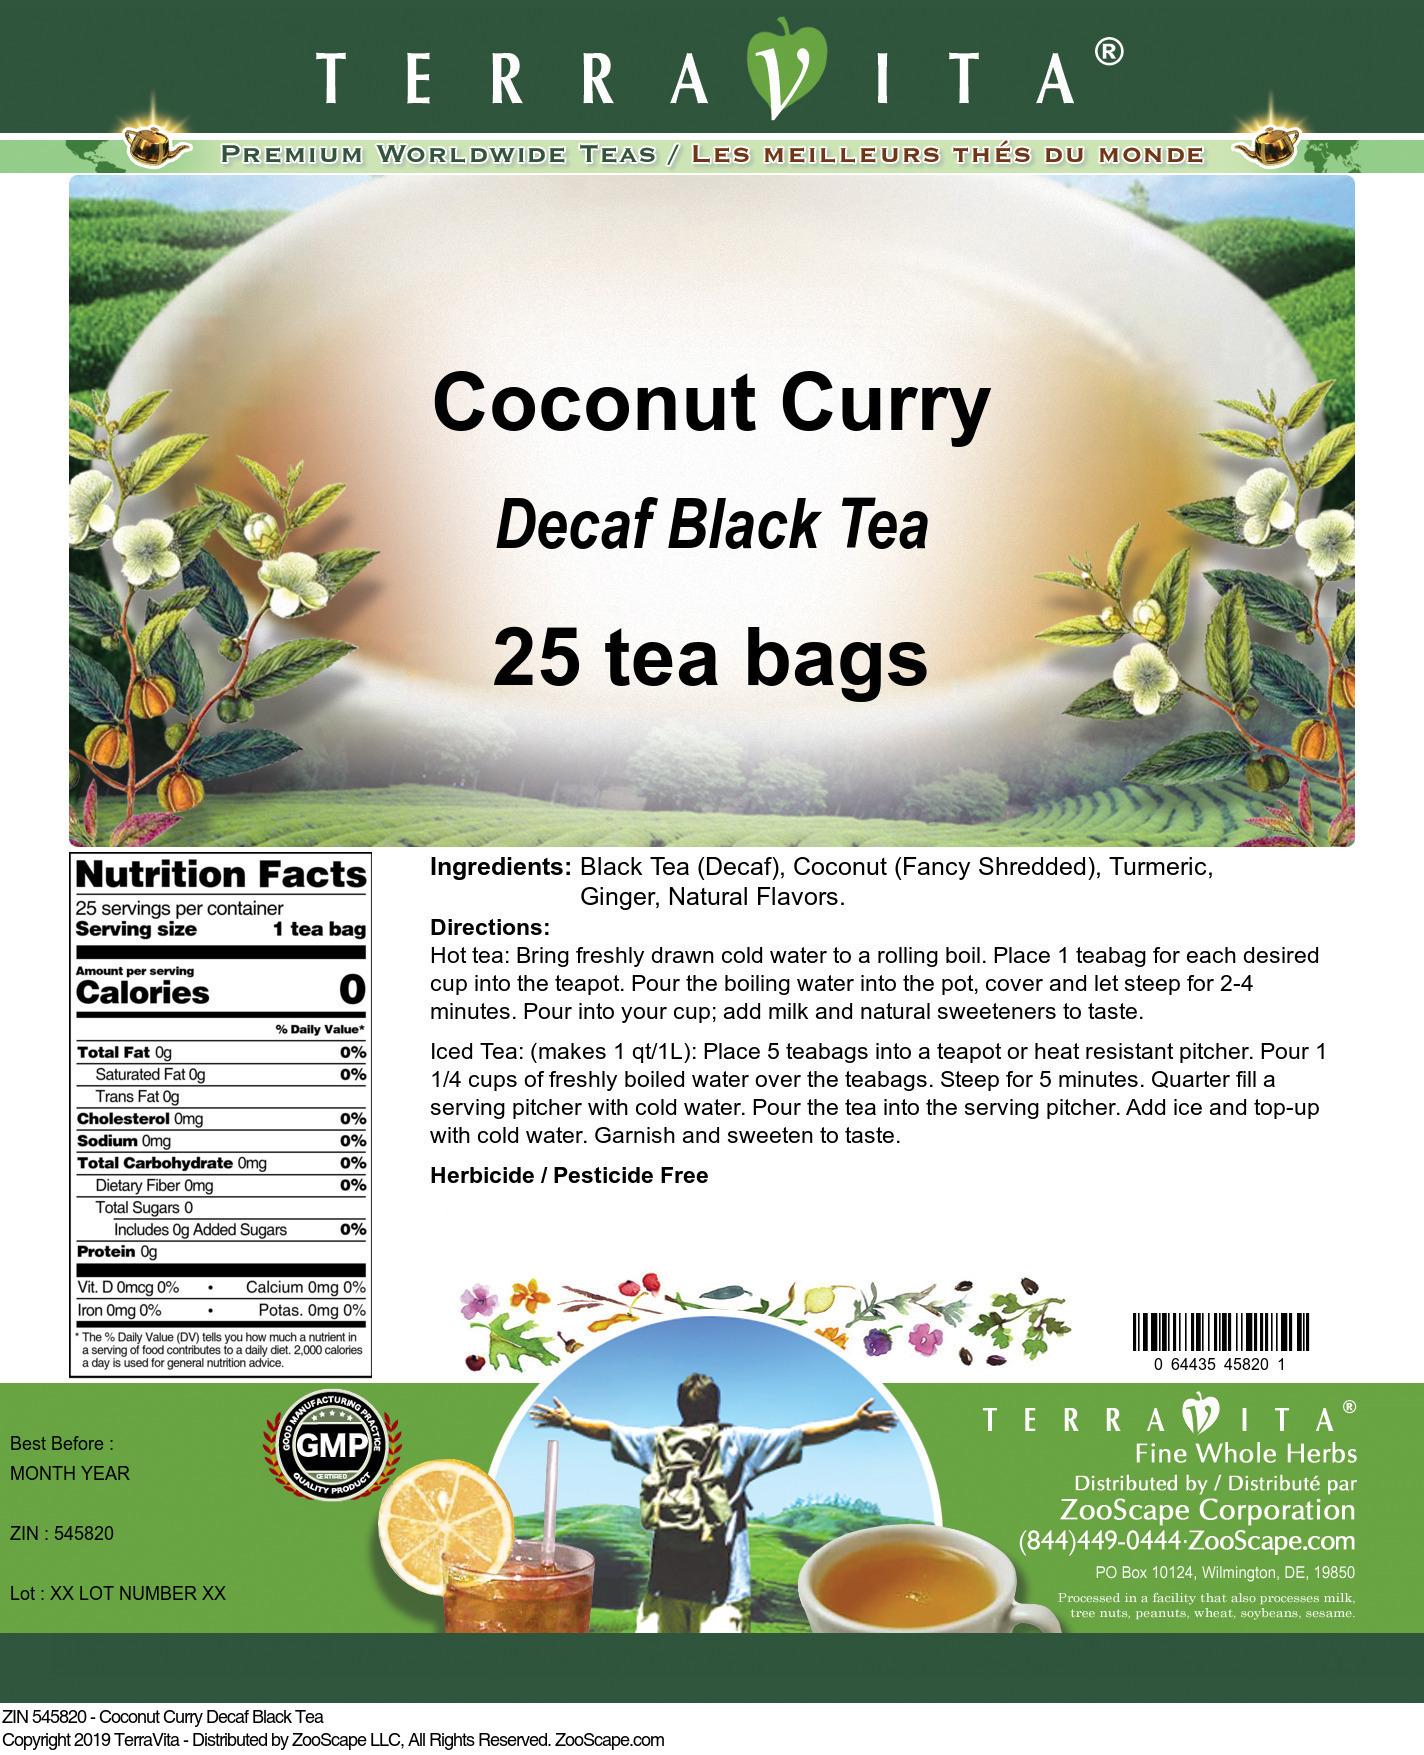 Coconut Curry Decaf Black Tea